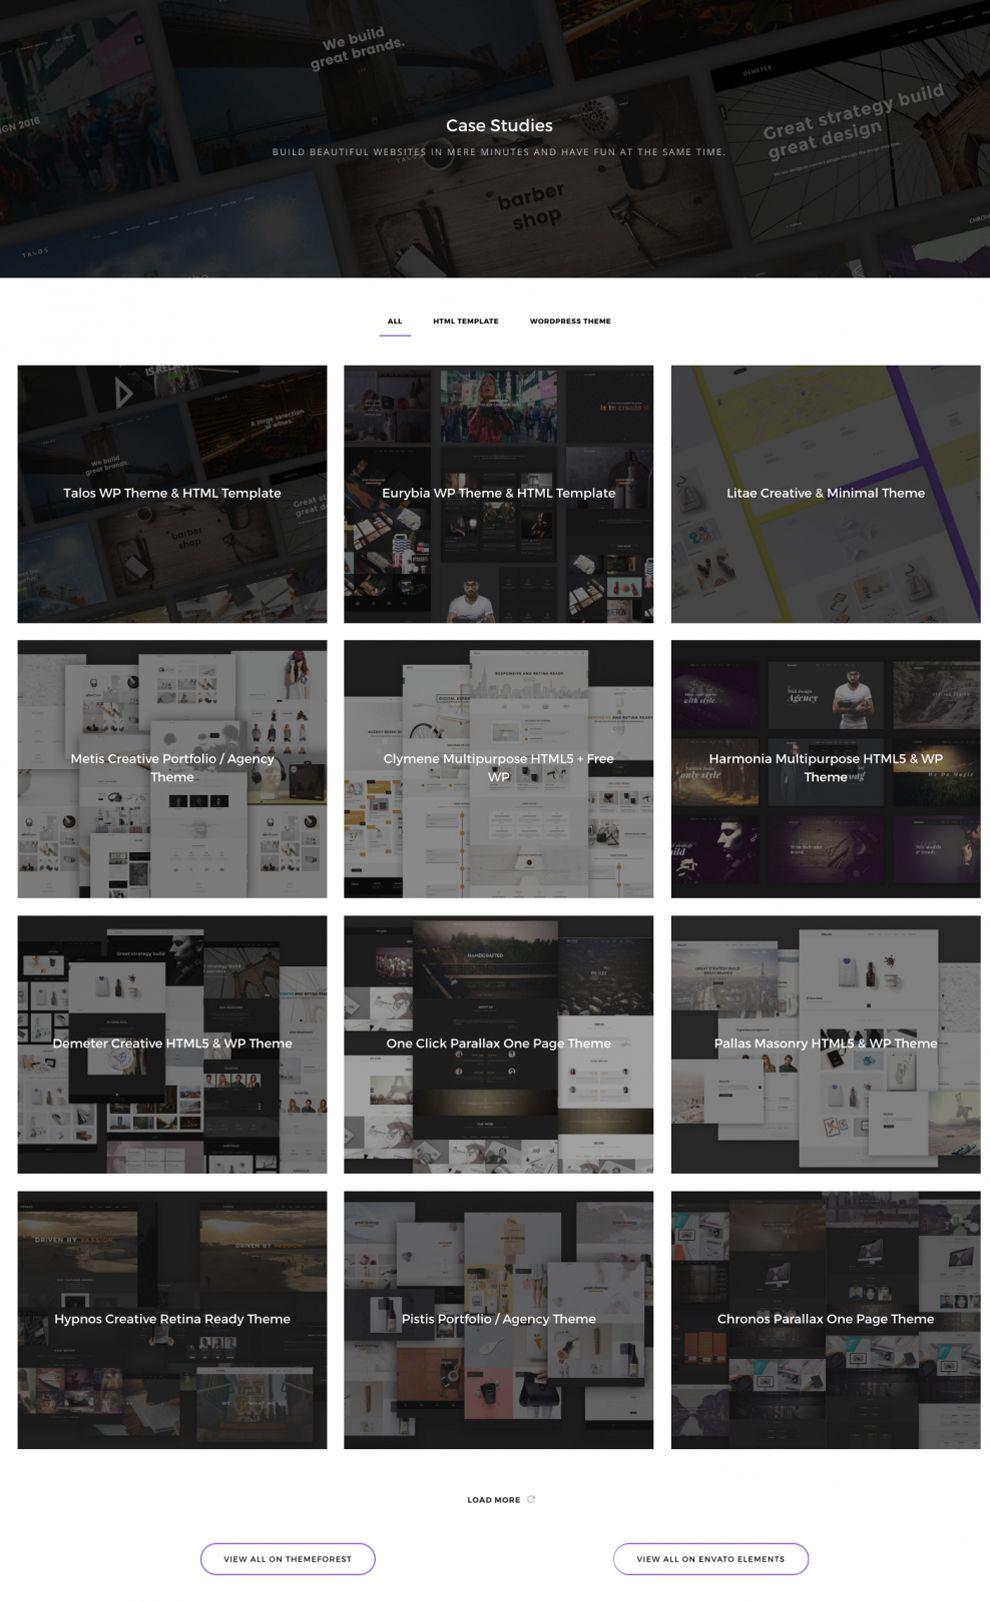 IG Design Clean Gallery Design